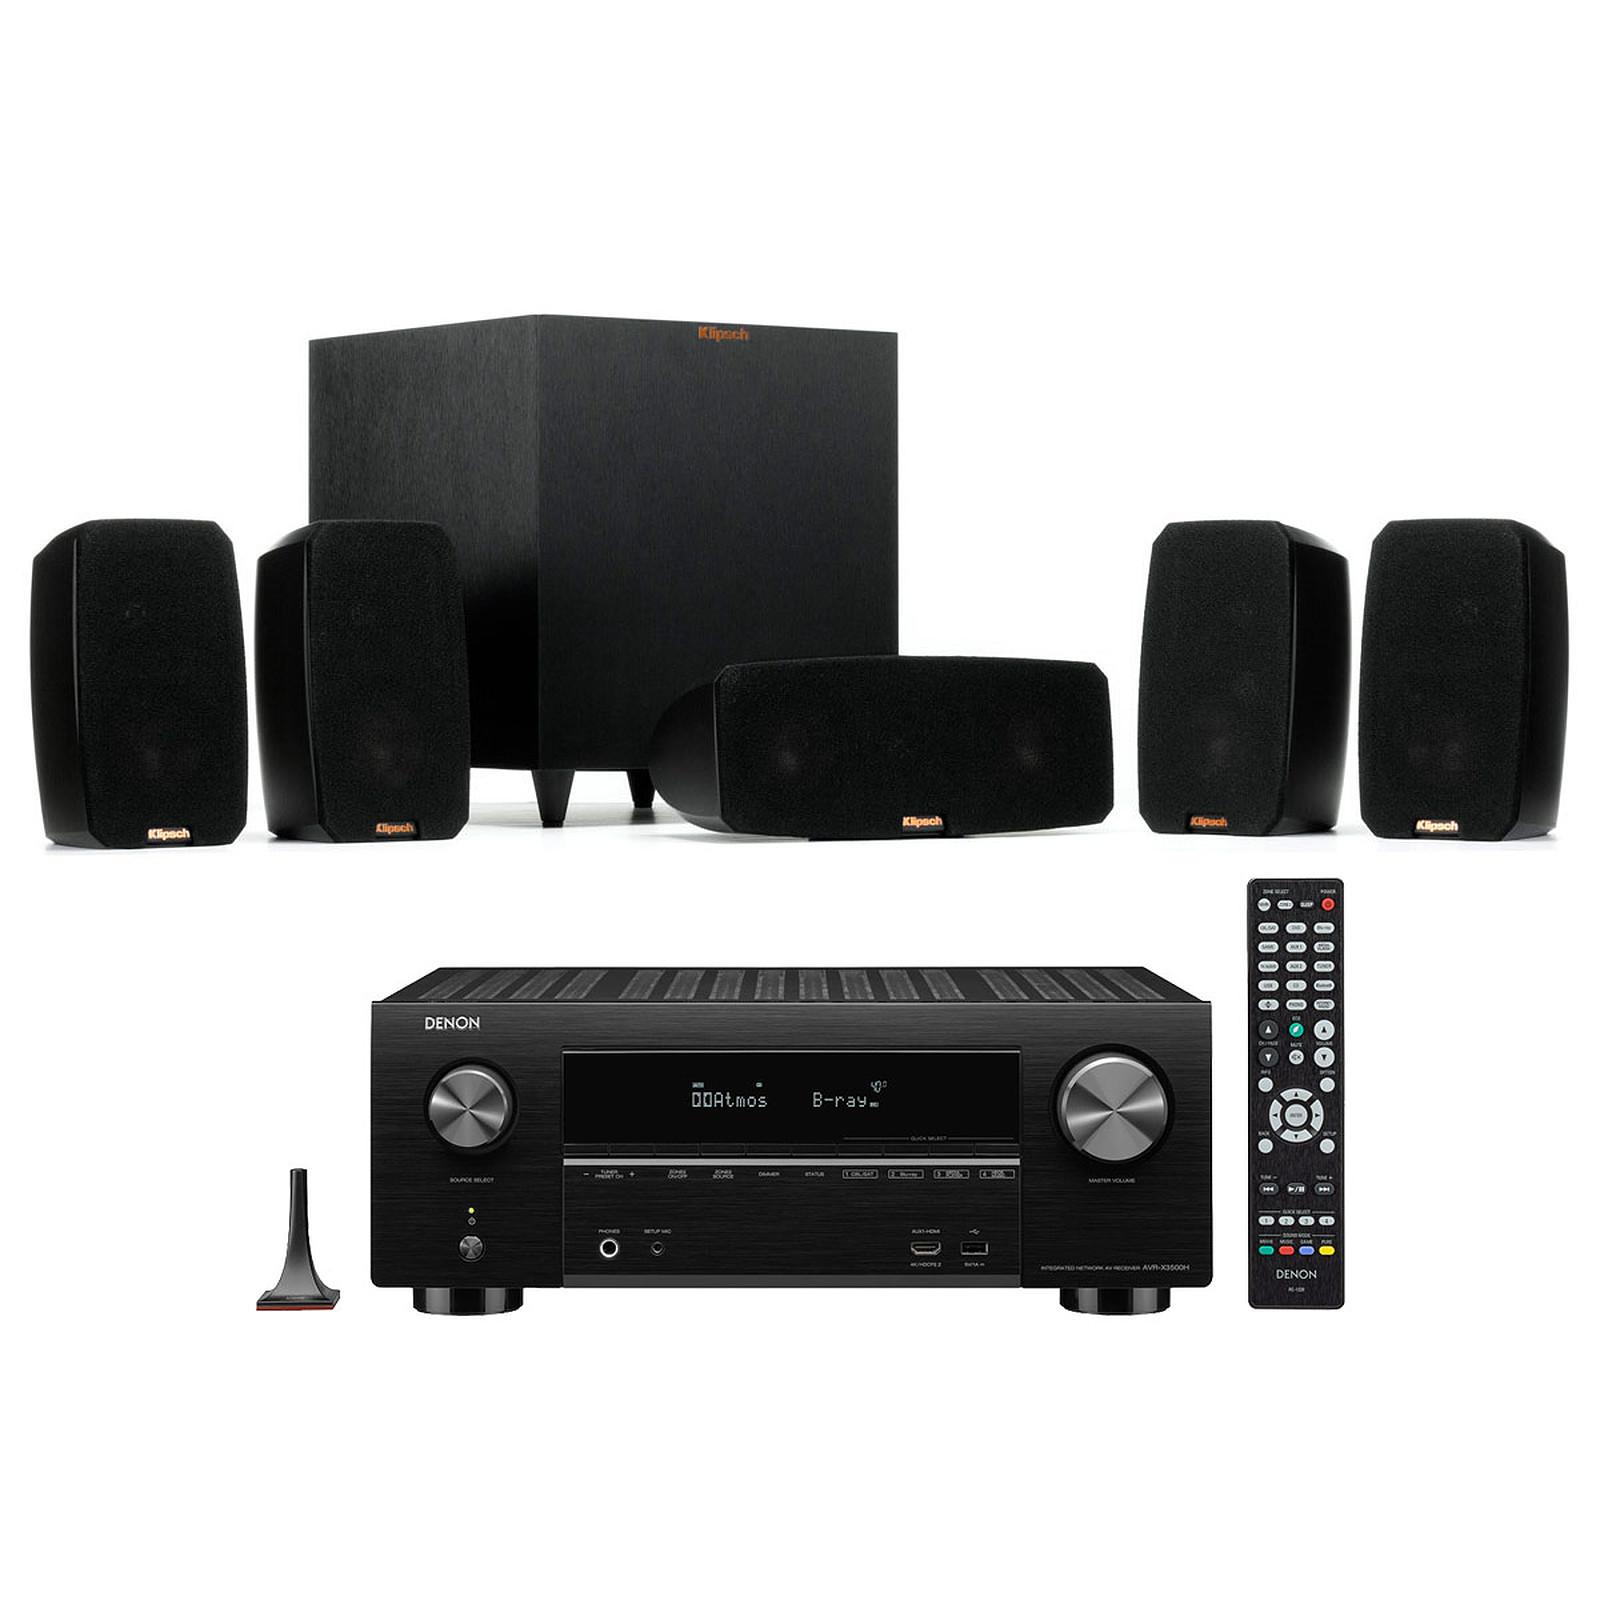 Denon AVR-X3500H Noir + Klipsch Reference Theater Pack